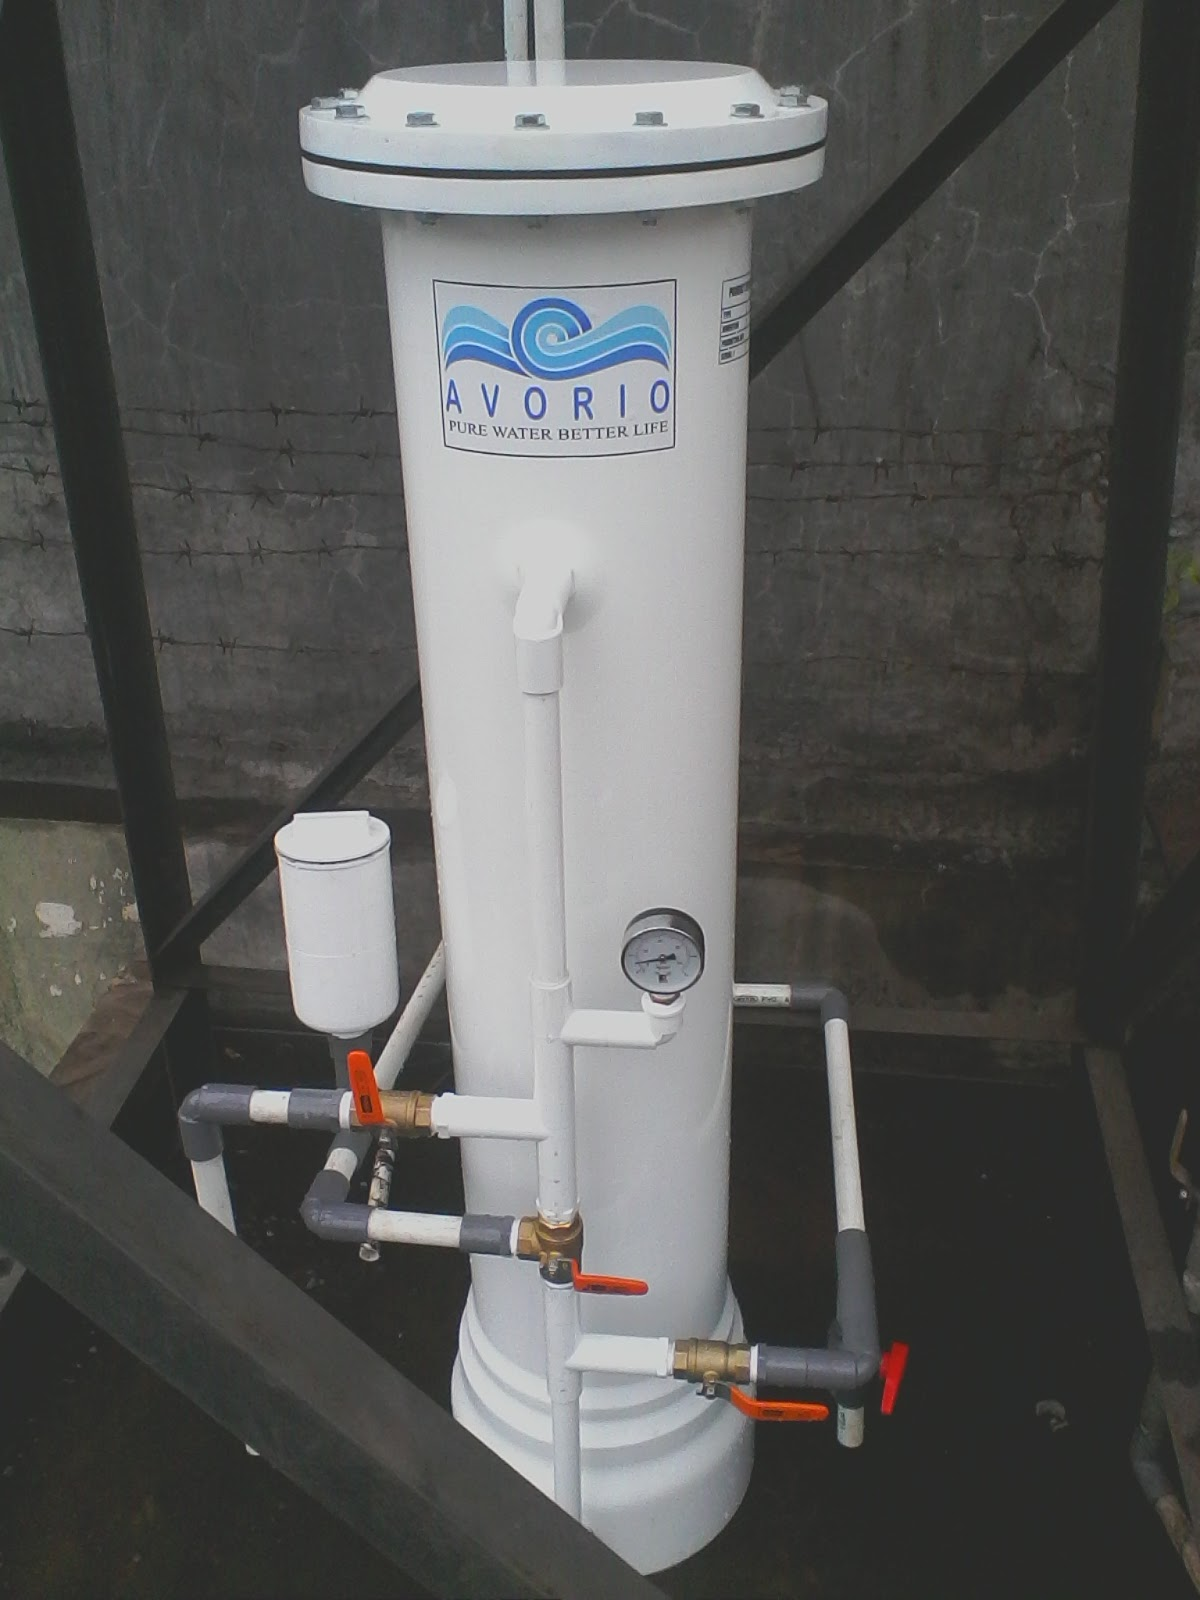 filter air di tangerang, jakarta, bandung, depok, bekasi, solo, surabaya